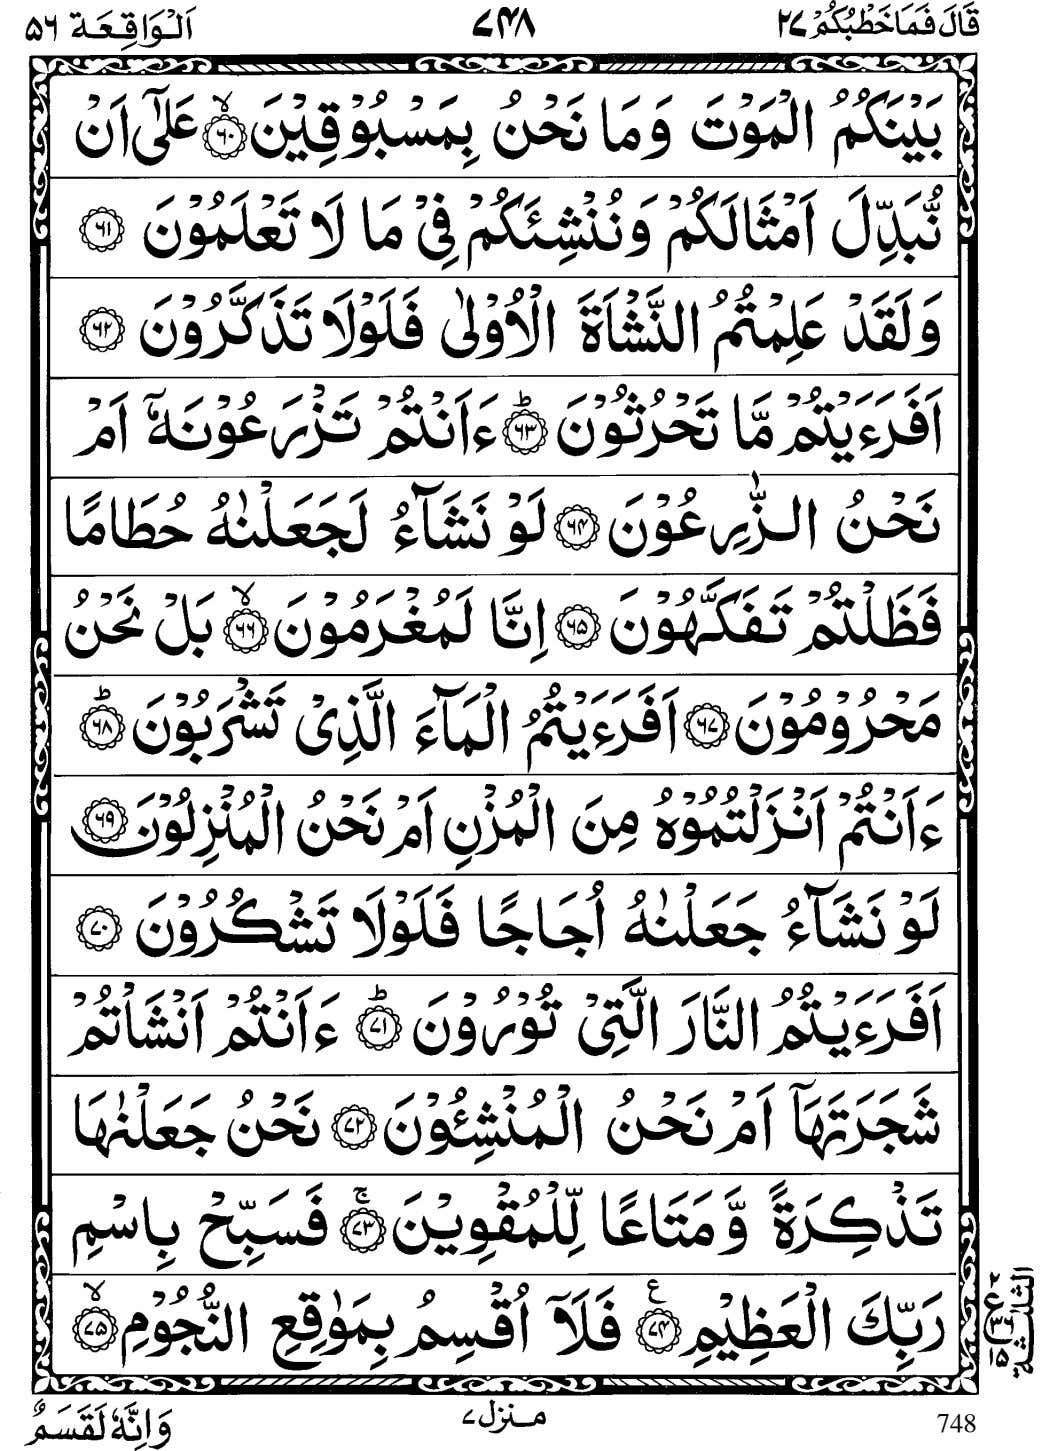 Surah Al Waqiah Arab Quran Quotes Love Reminder Quotes Islamic Messages